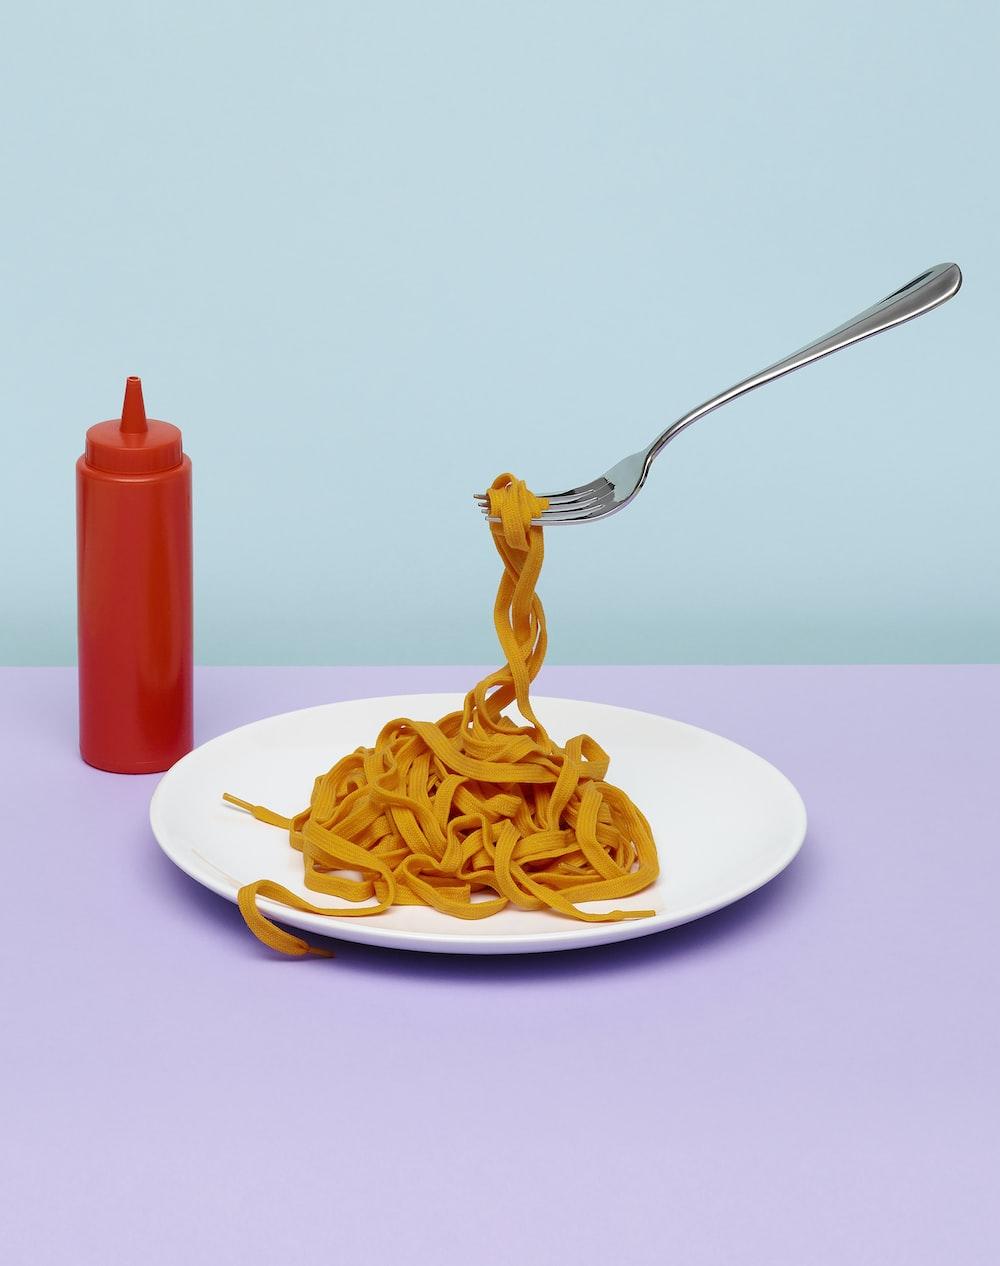 pasta on white ceramic plate